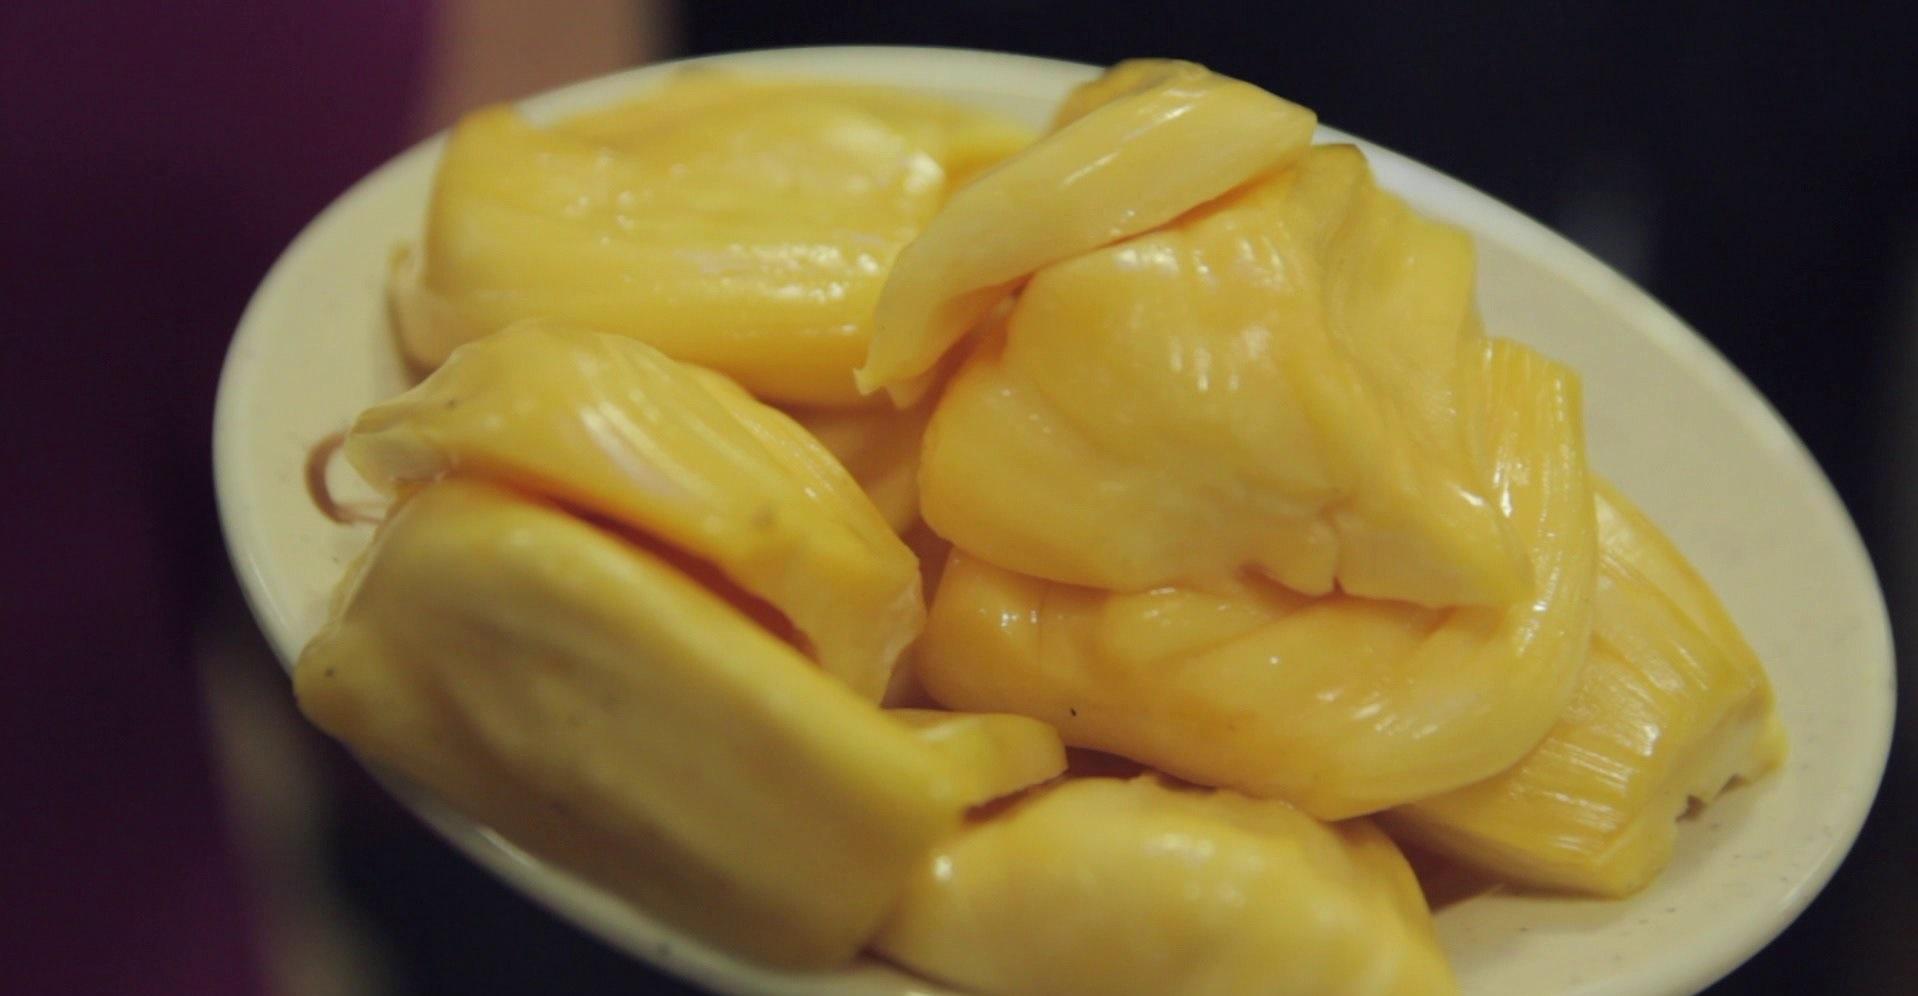 Exotic Food Challenge: Jack Fruit